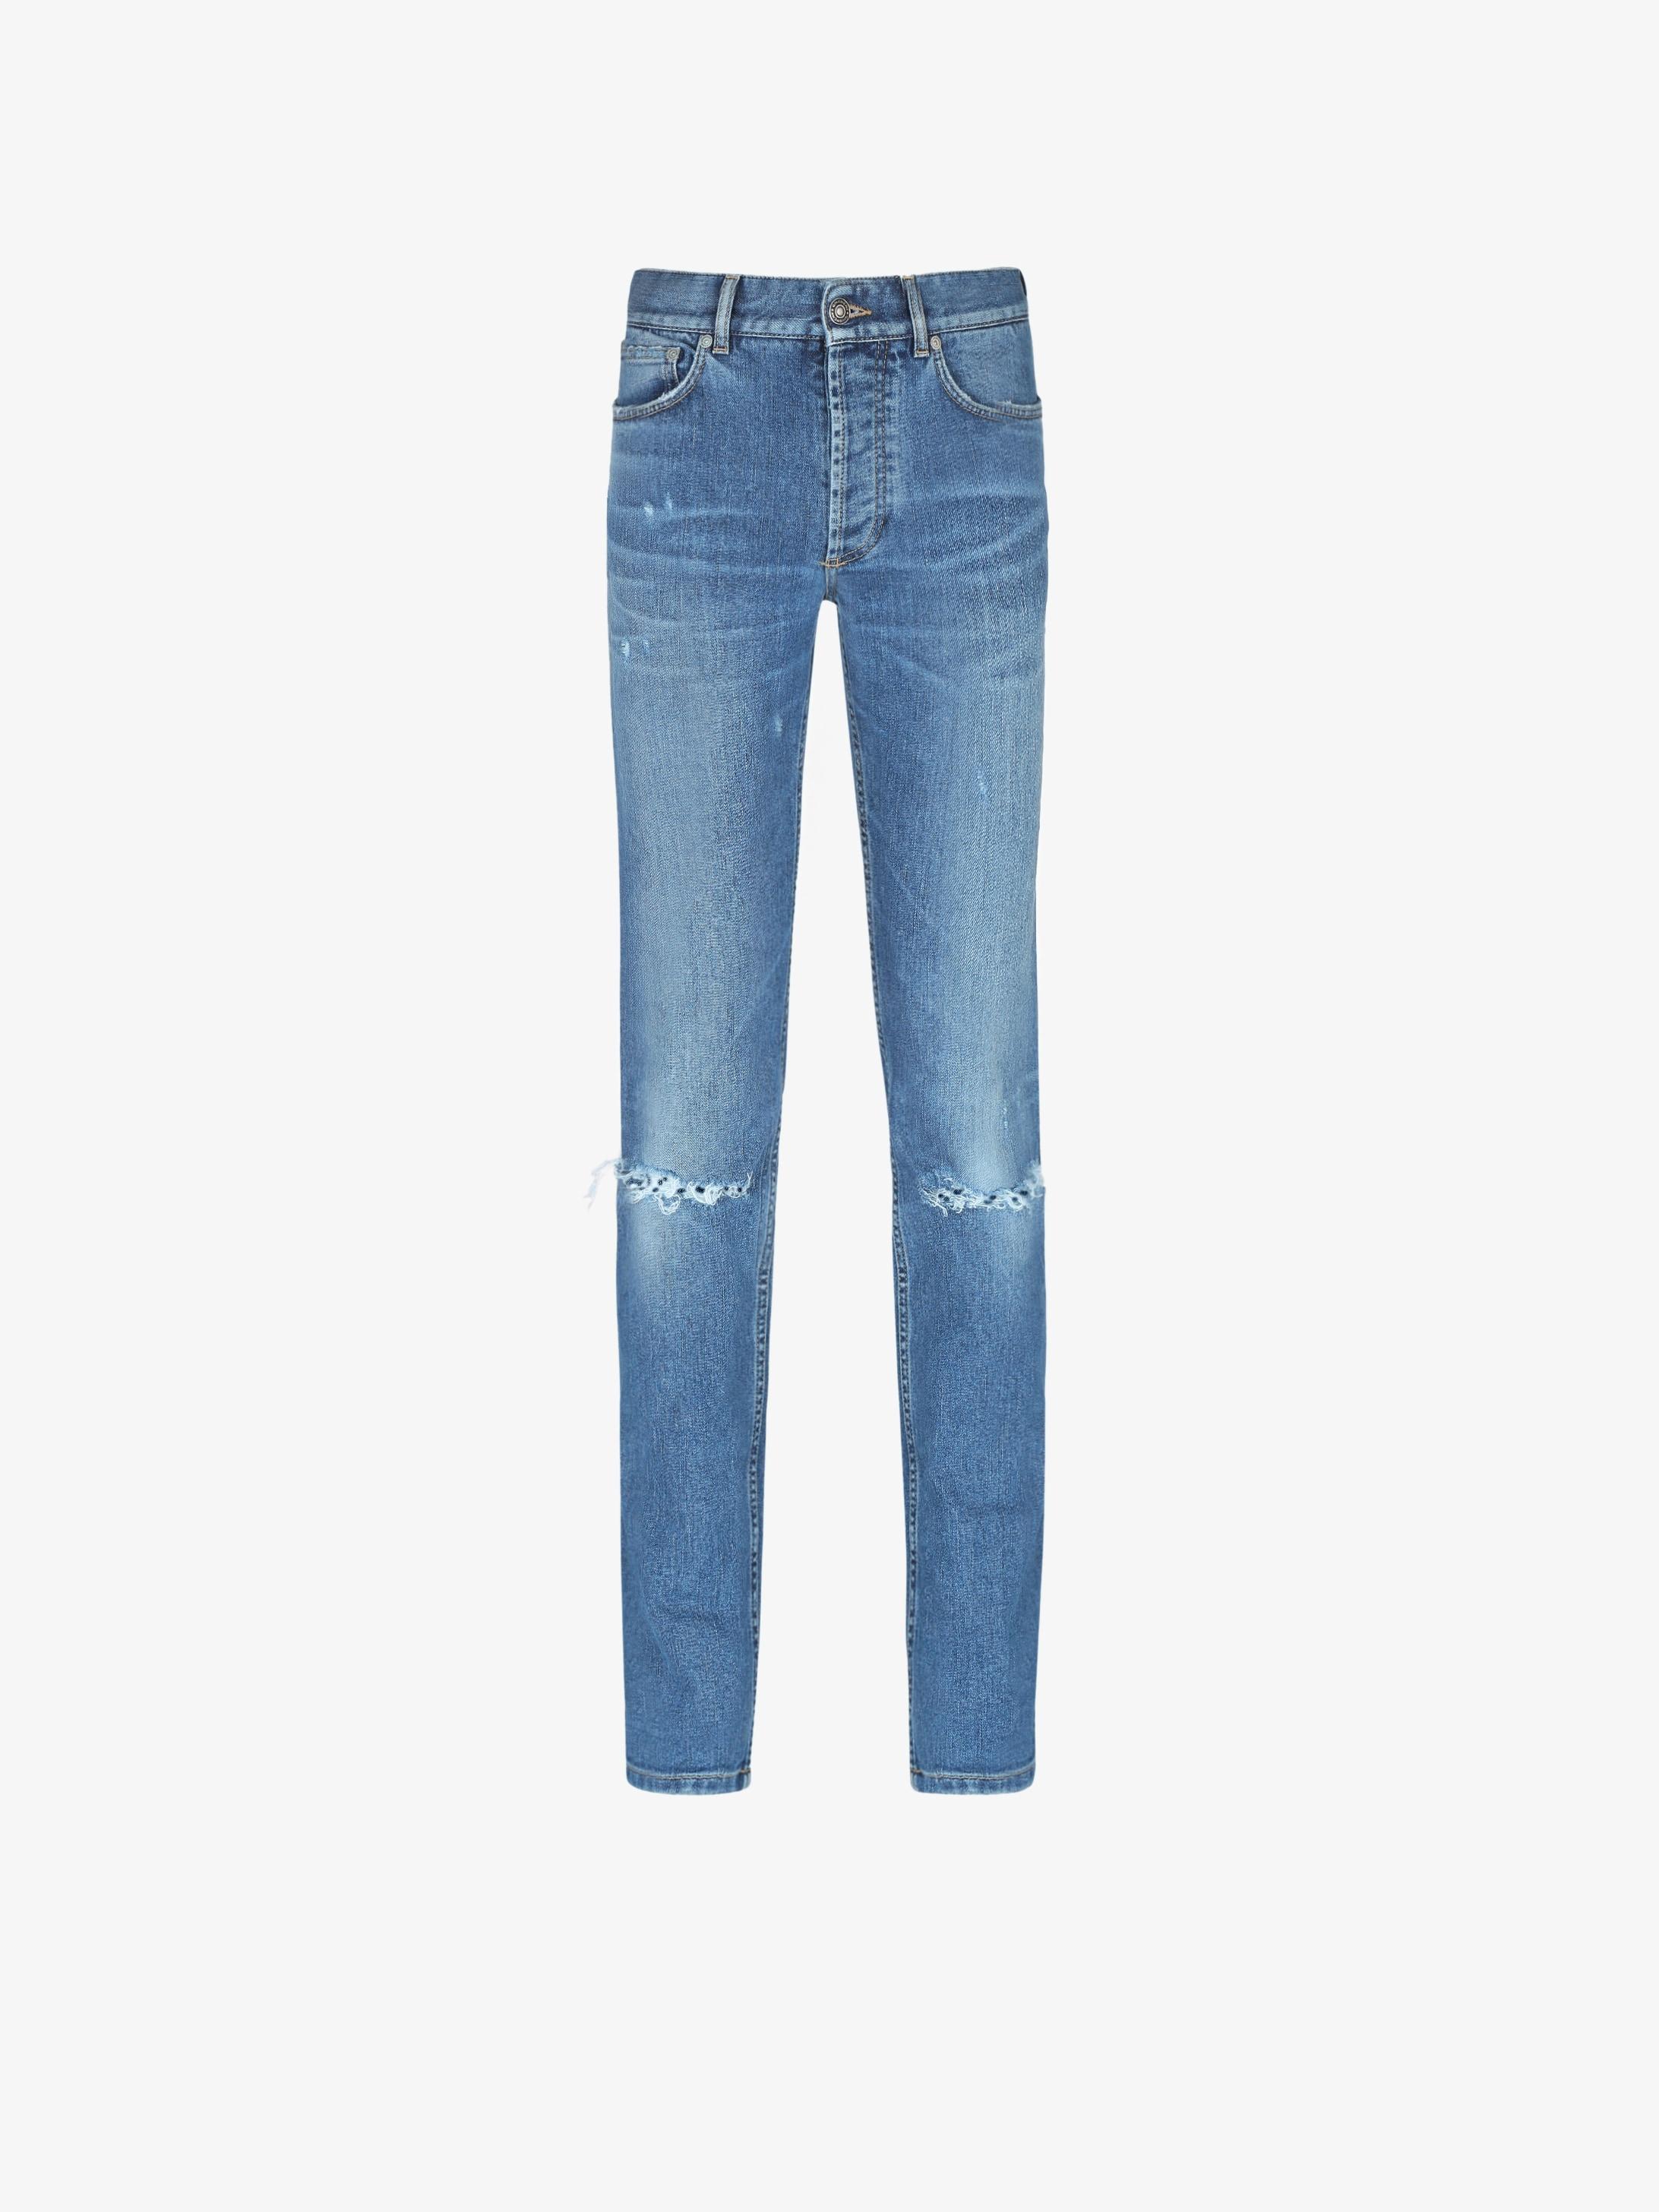 GIVENCHY destroyed jean slim